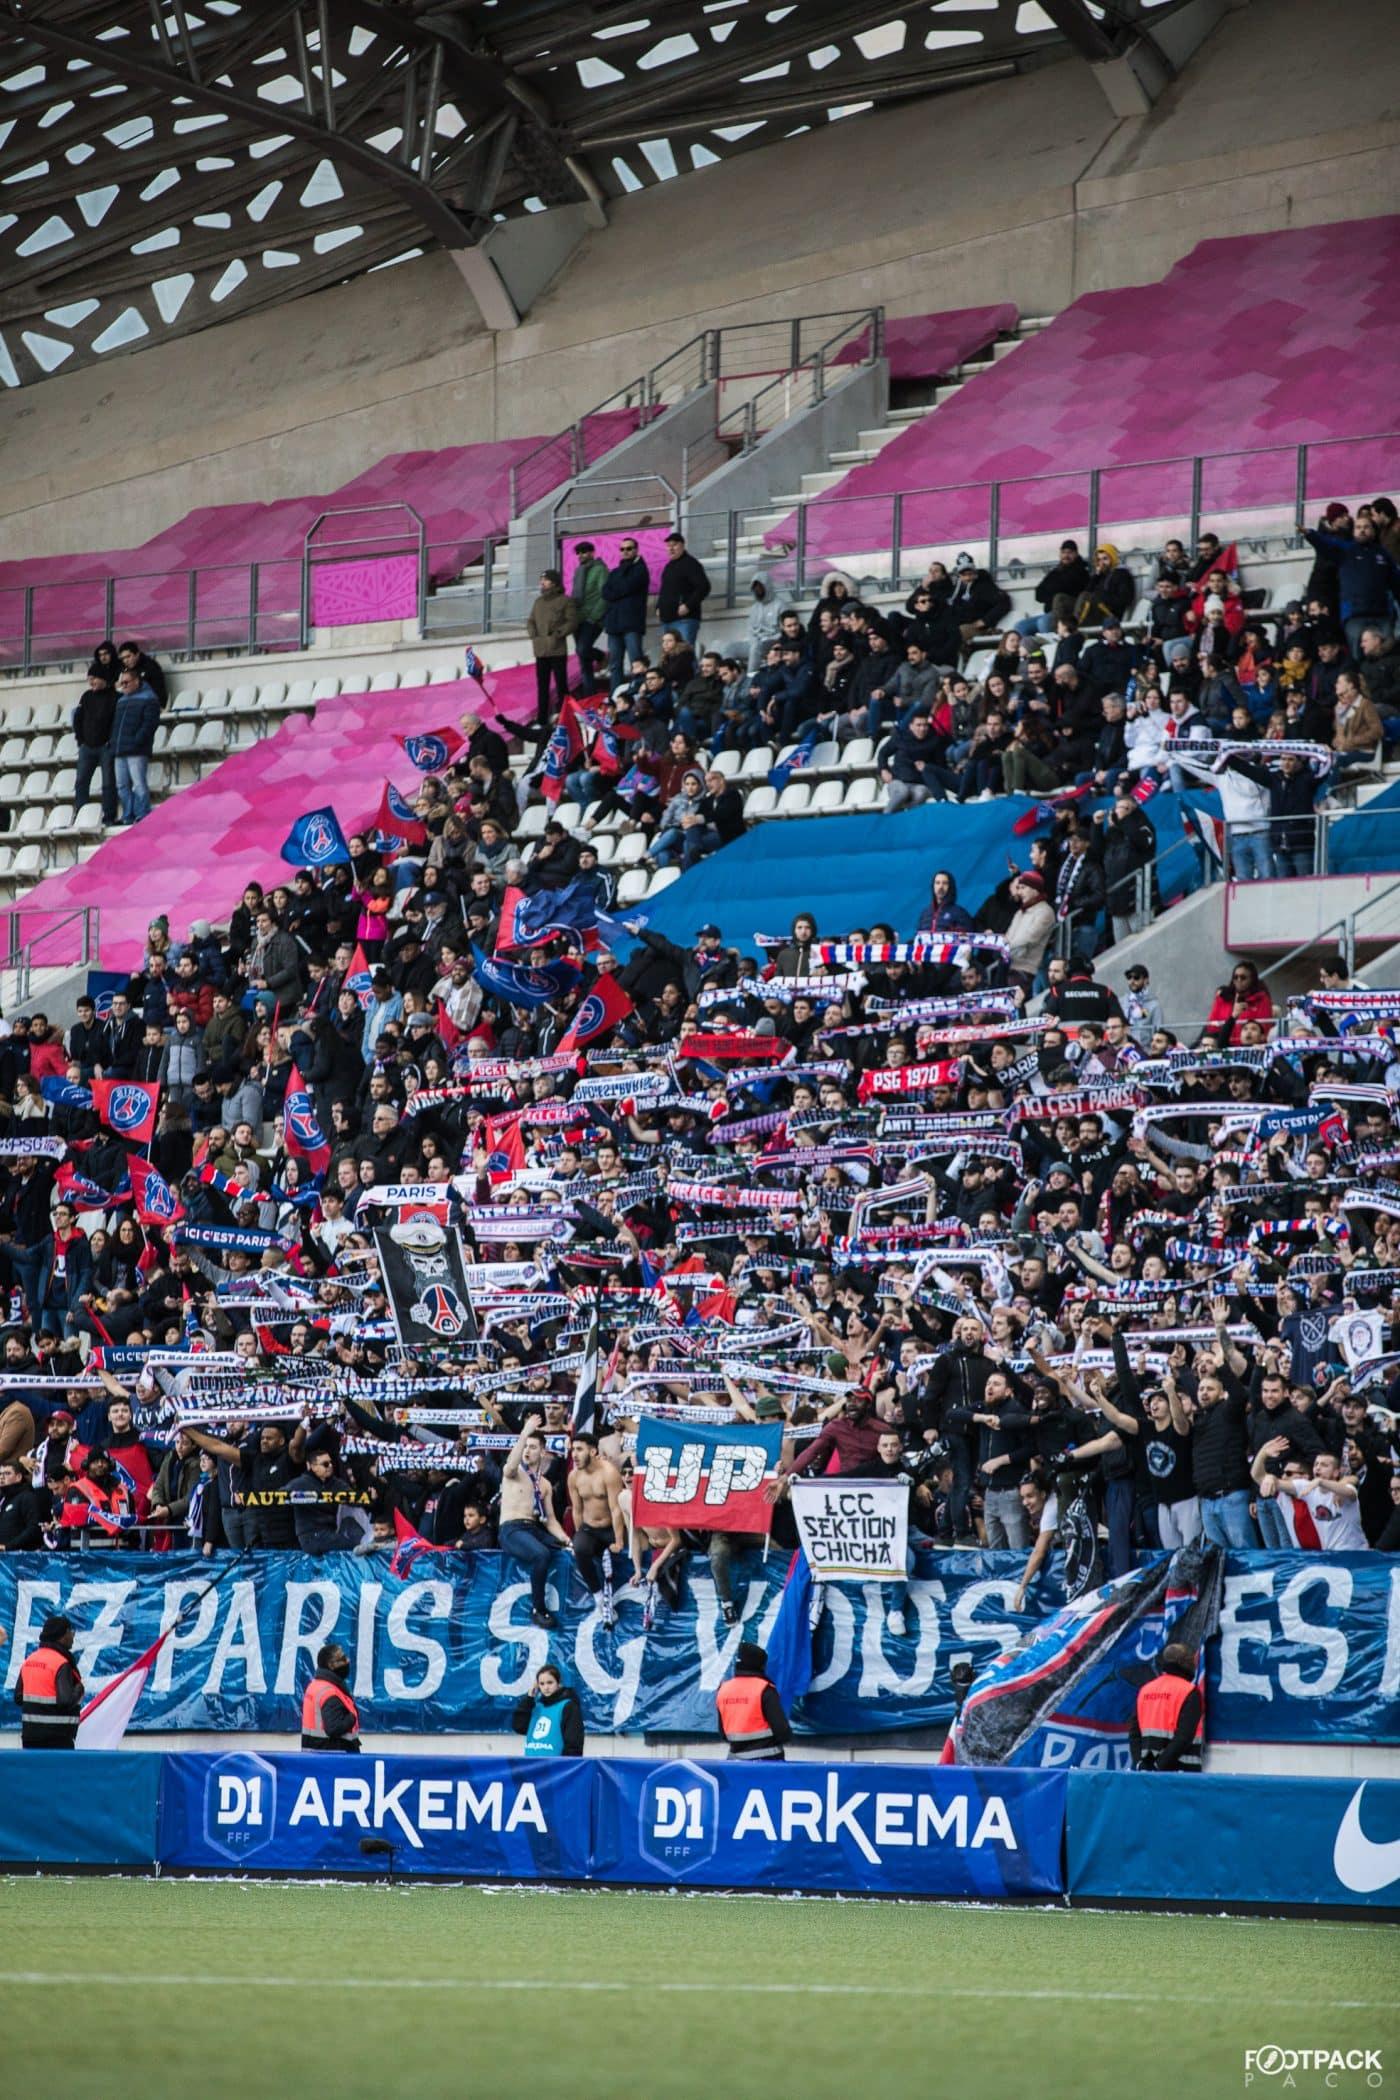 au-stade-paris-saint-germain-psg-olympique-de-marseille-d1-feminine-arkema-footpack-27